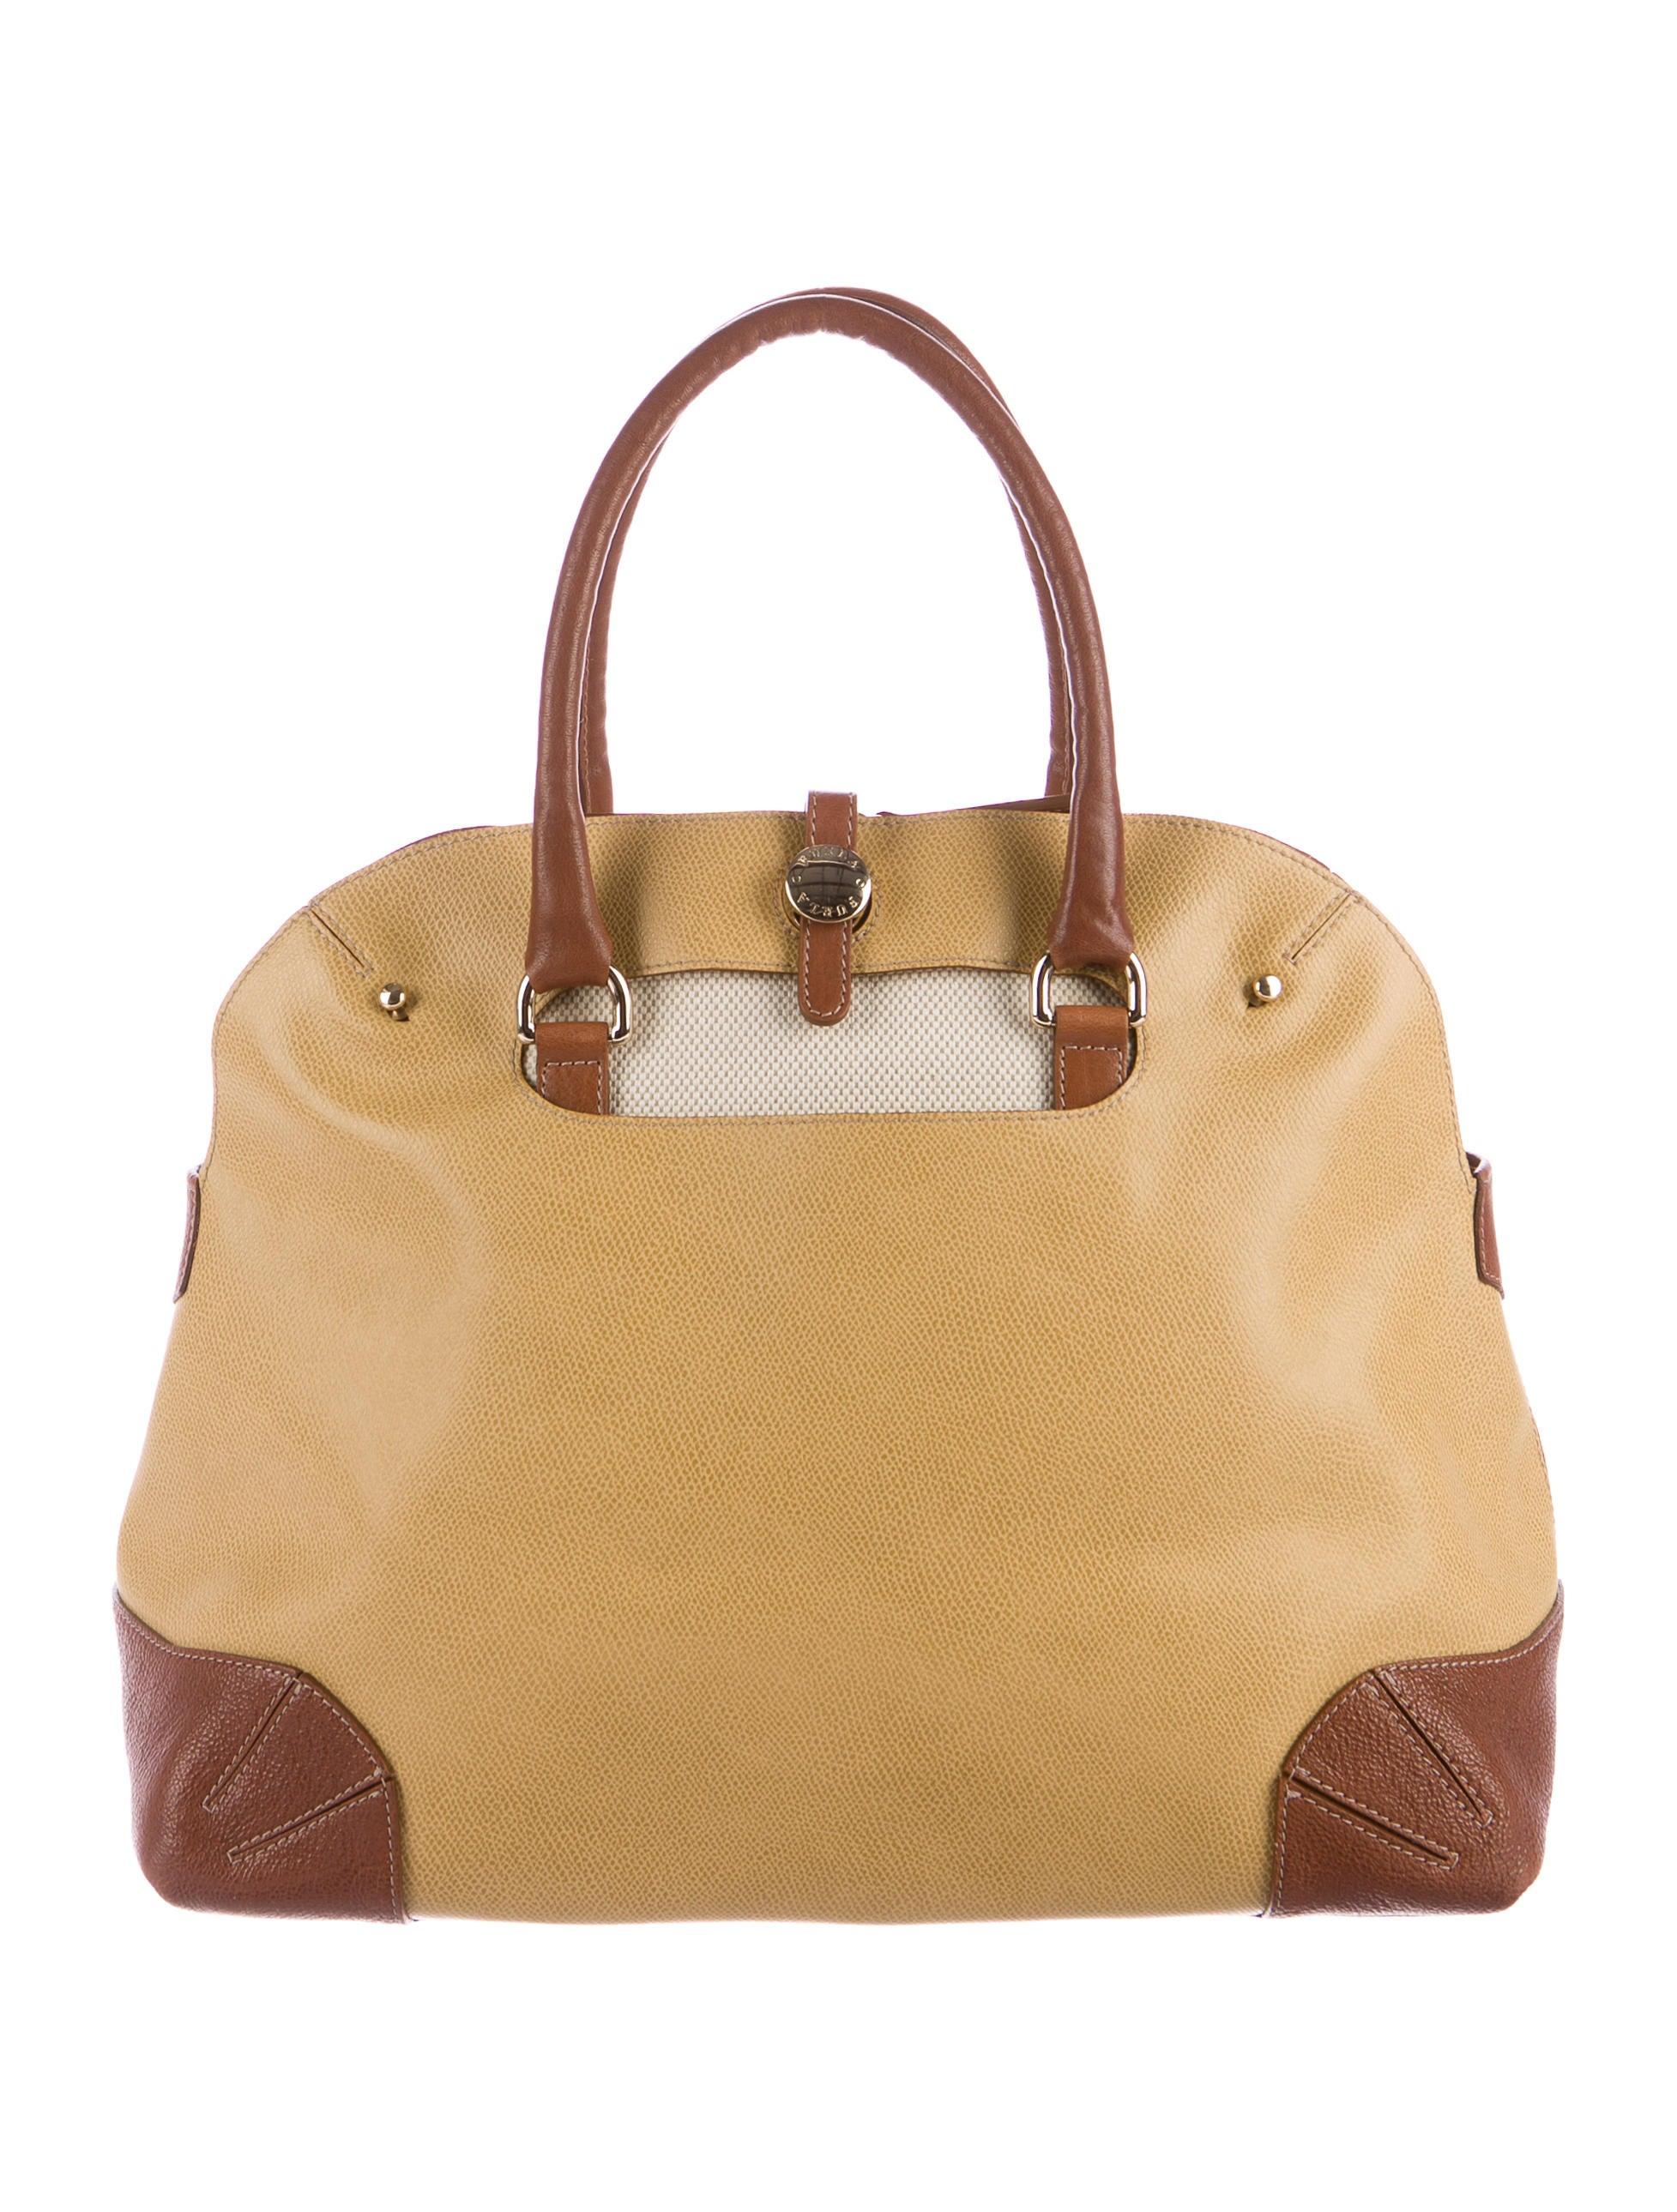 7531899ba3 Furla Textured Leather Tote - Handbags - WFU20350